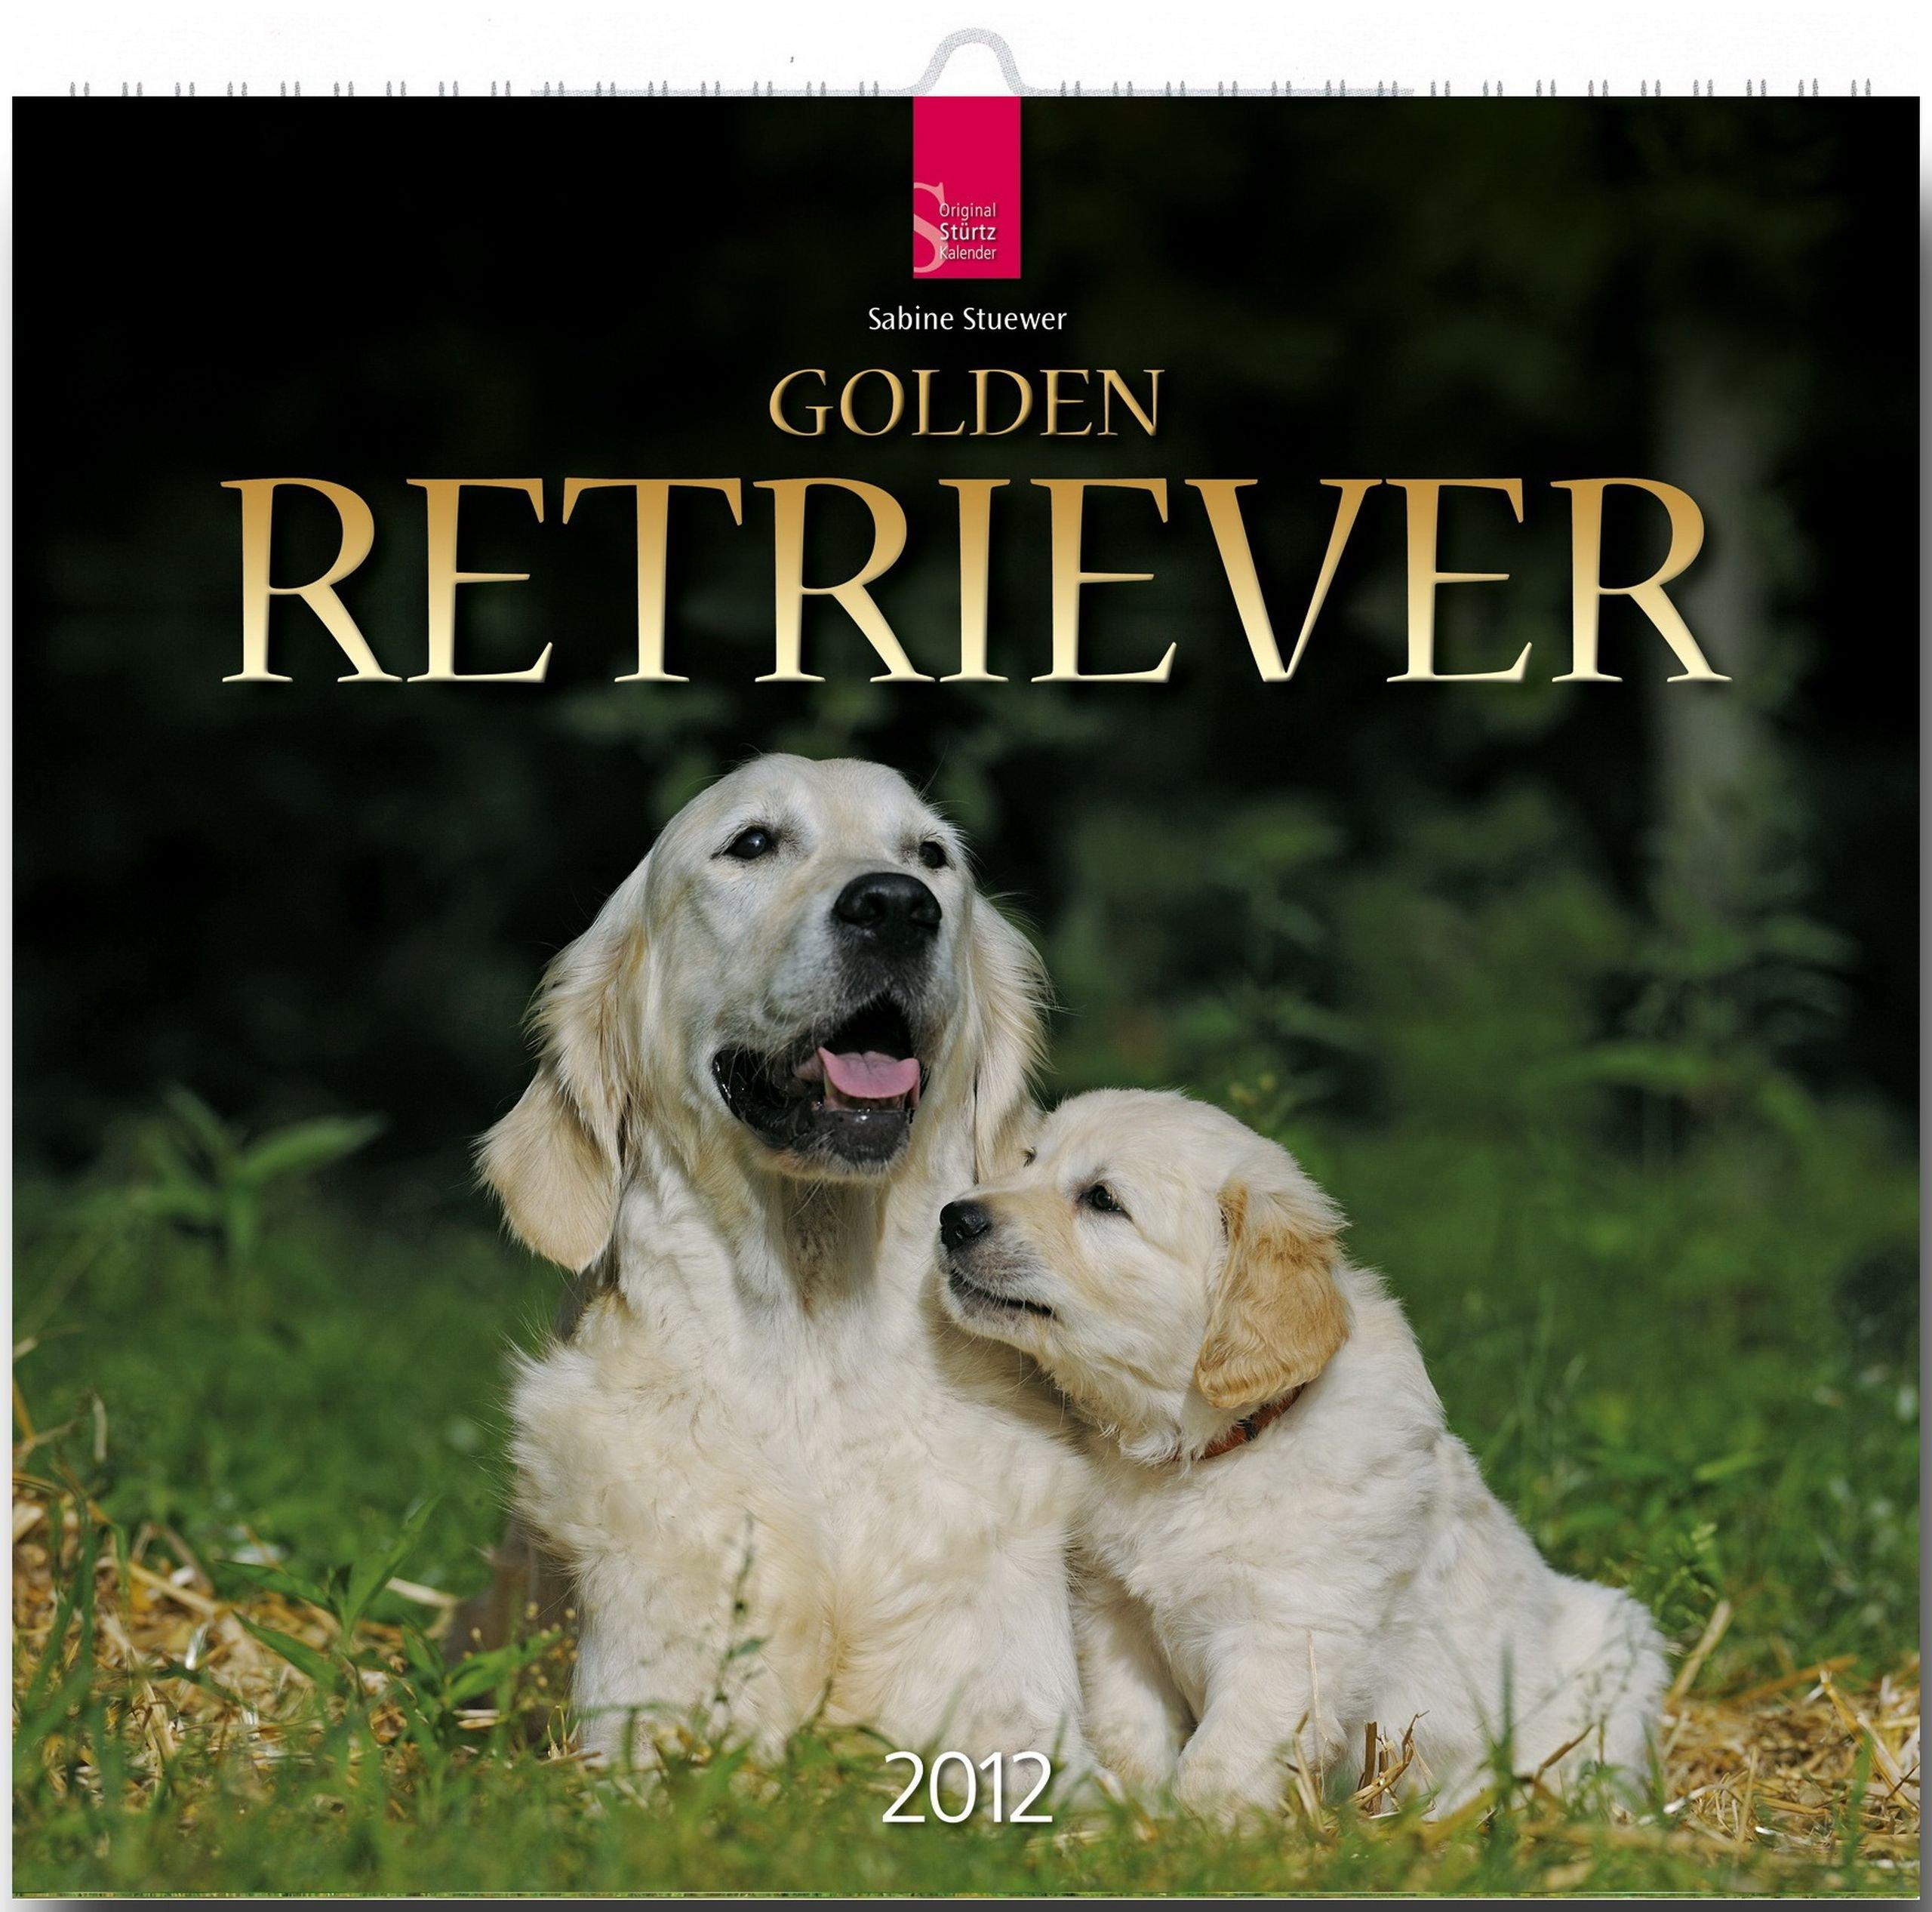 Golden Retriever 2012